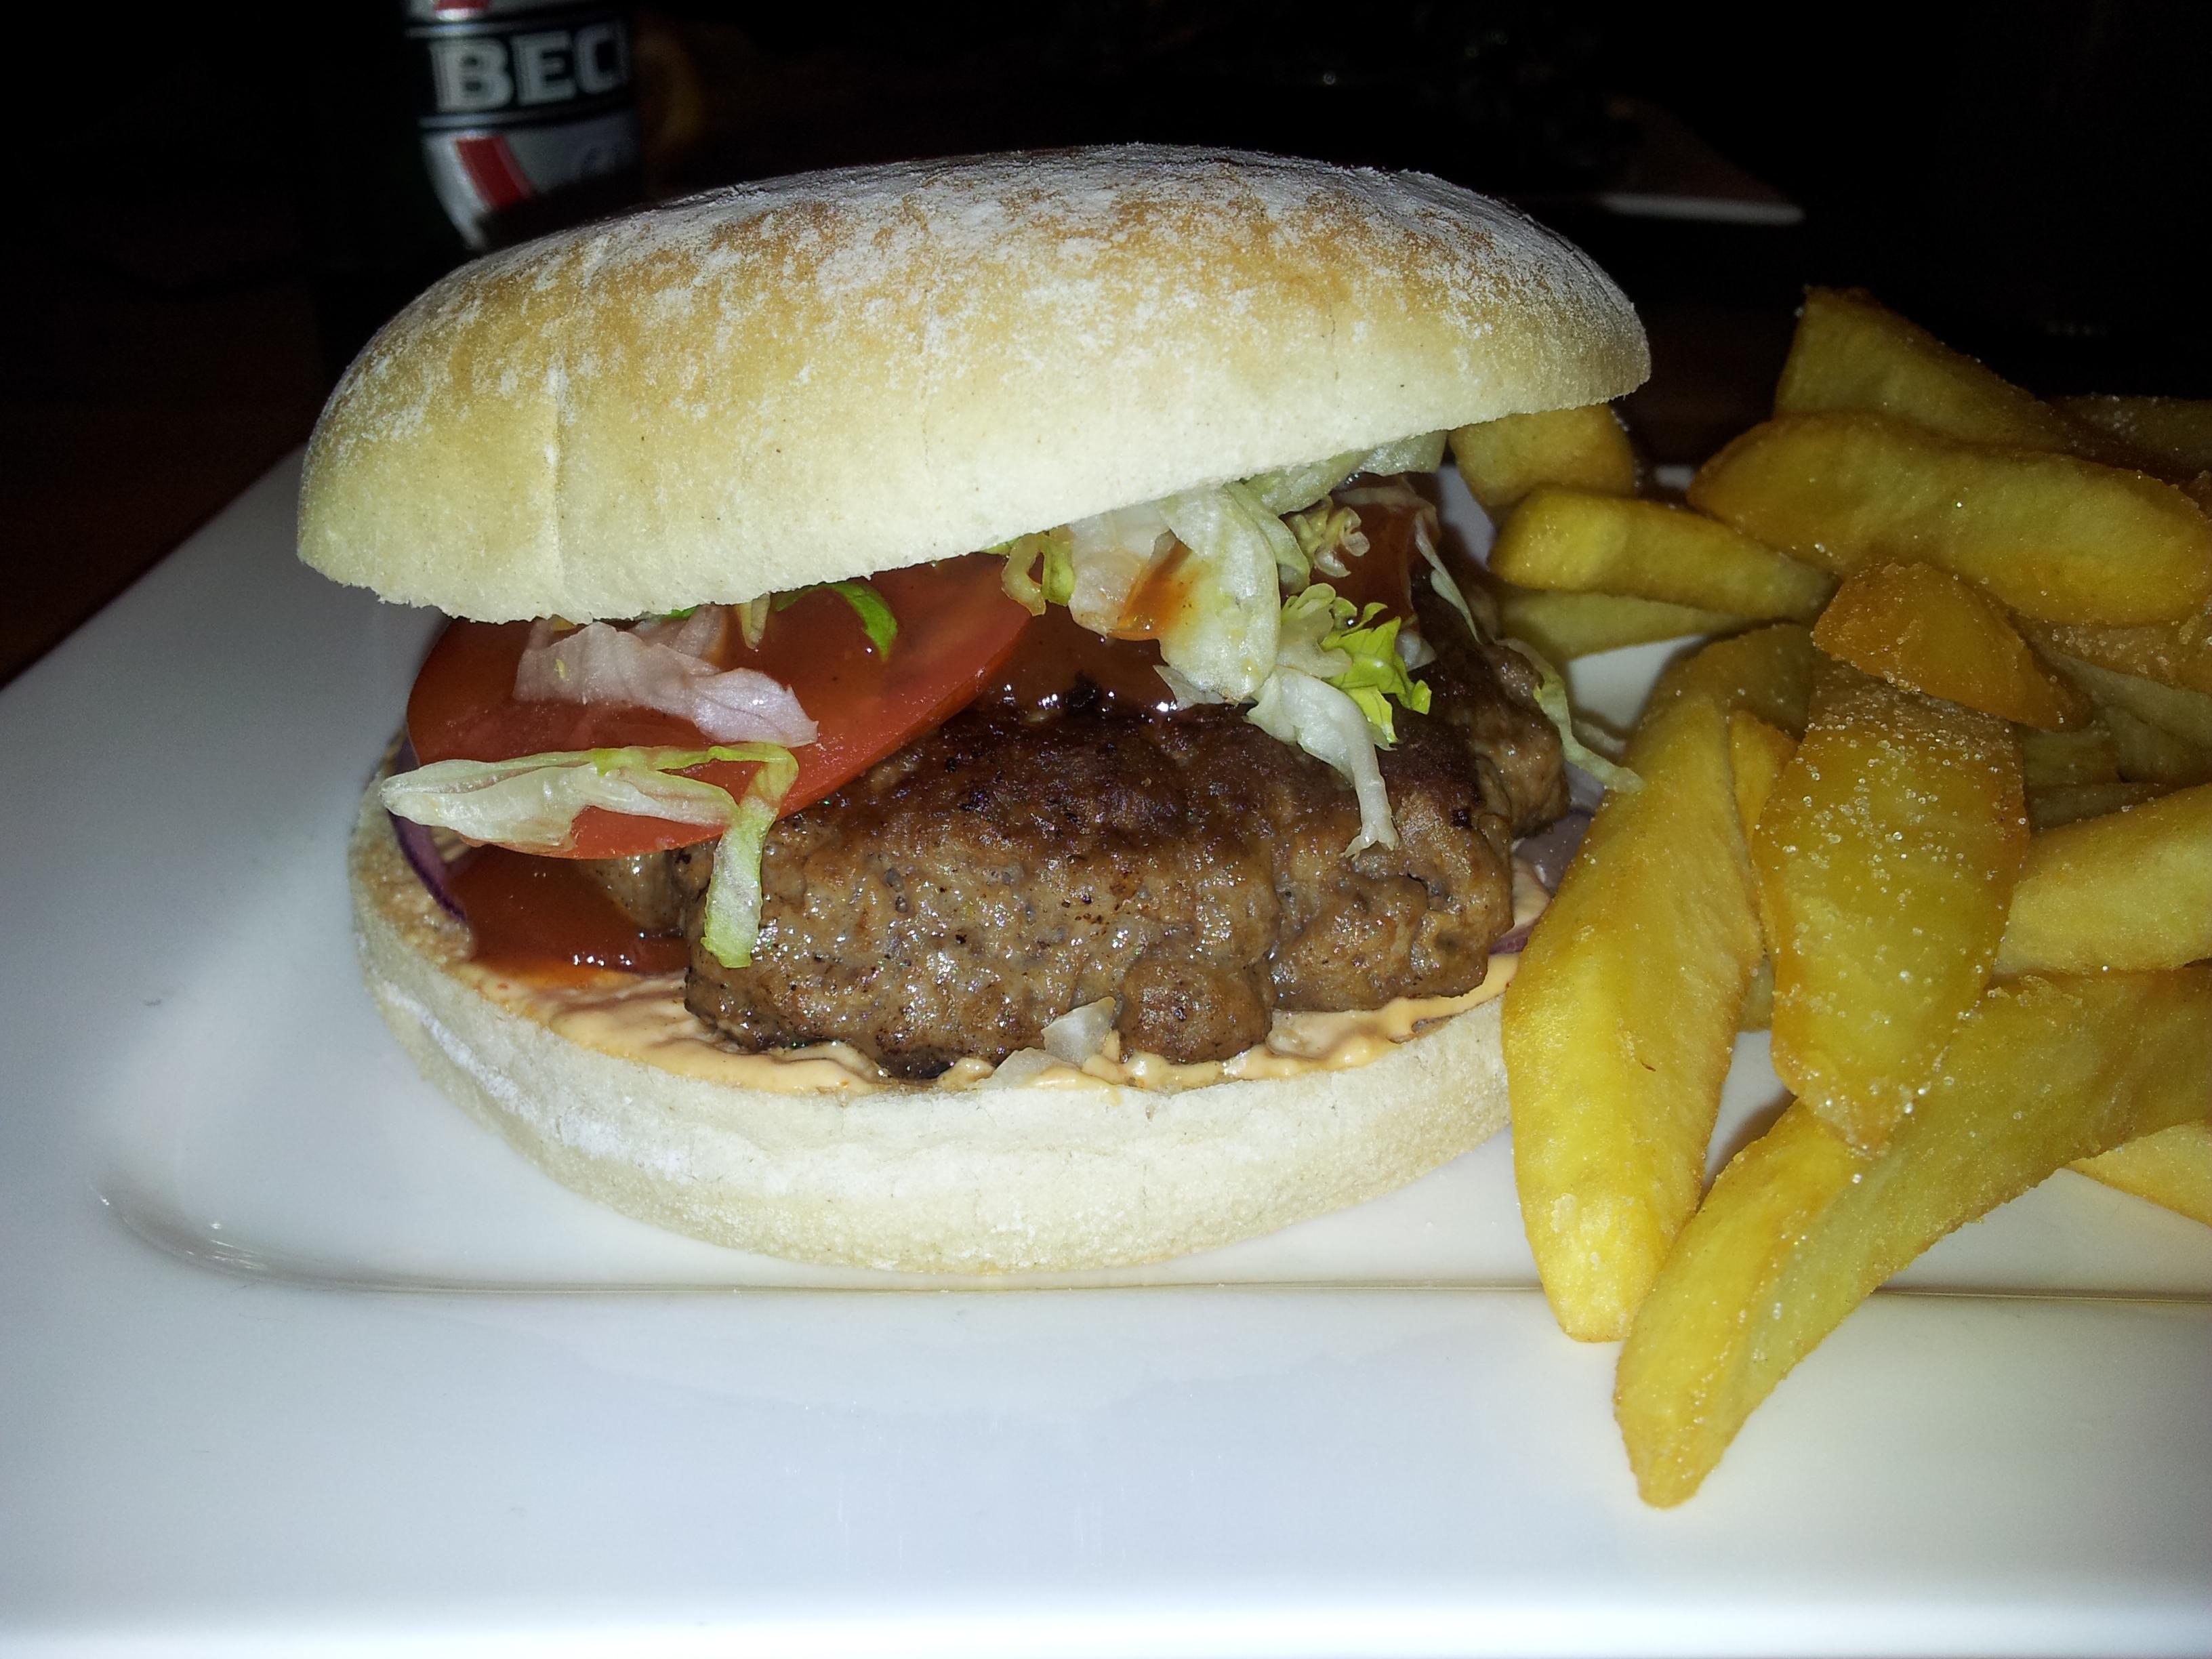 Gourmet Hamburger mit Pommes: 7,80.